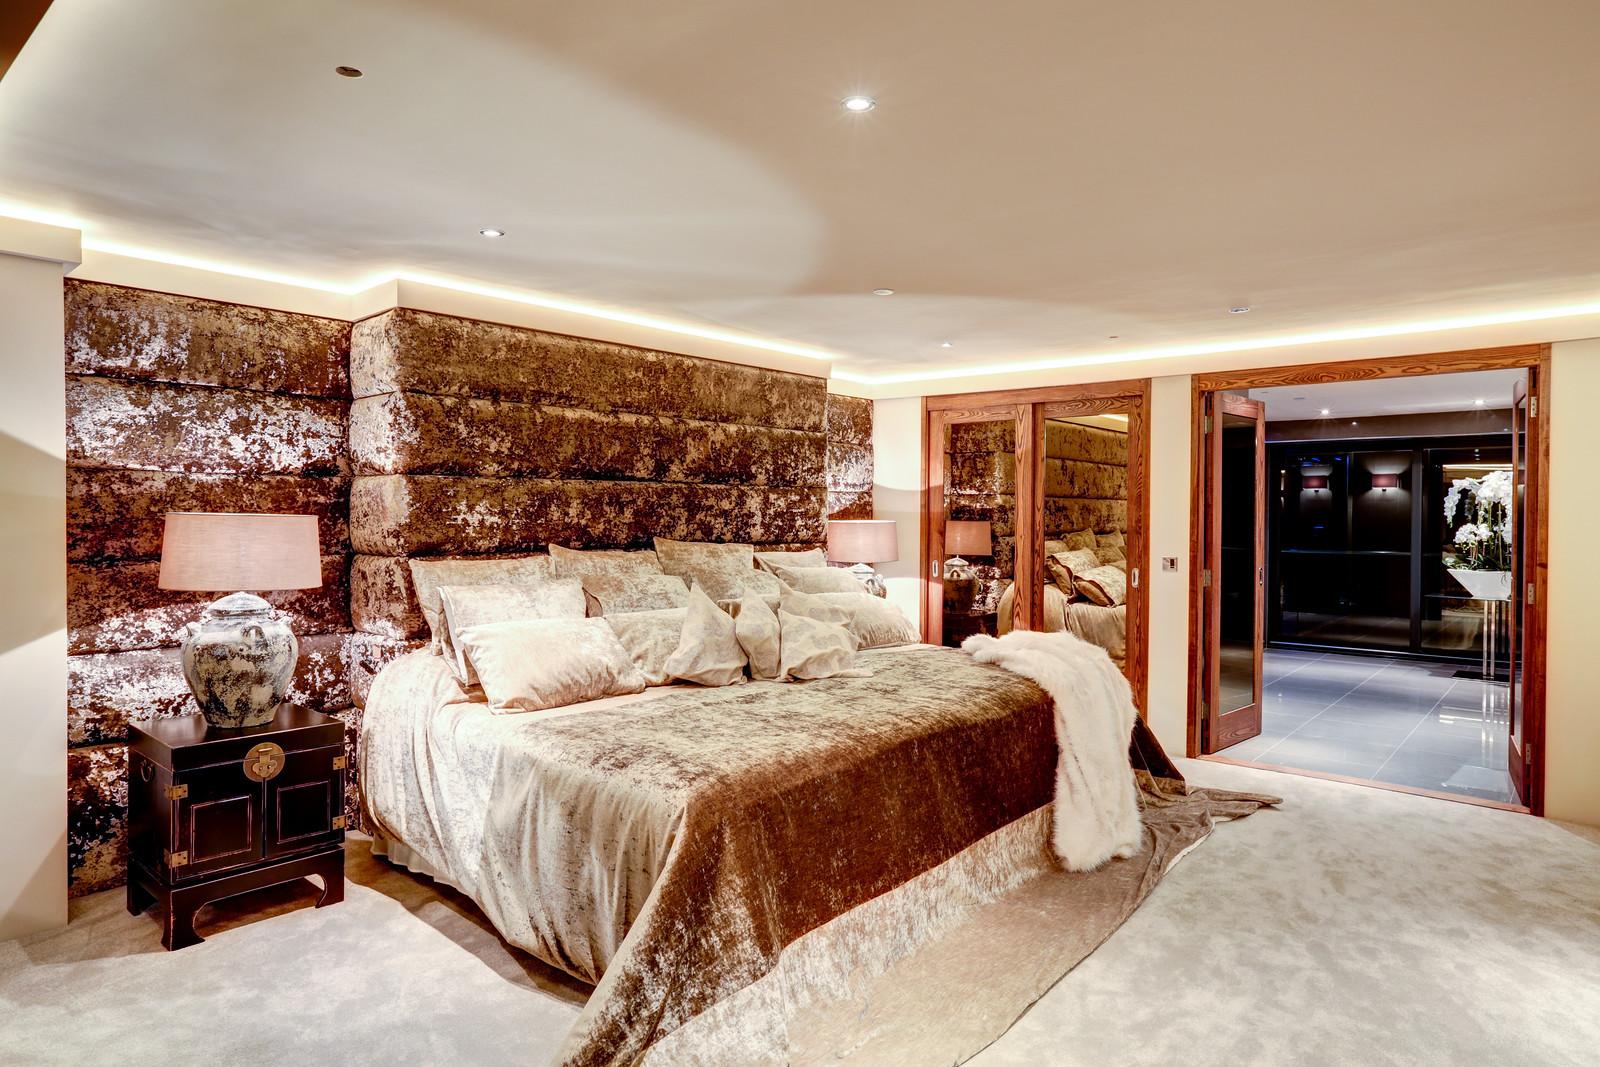 Luxurious bedroom in Tanglewood, Colston Bassett